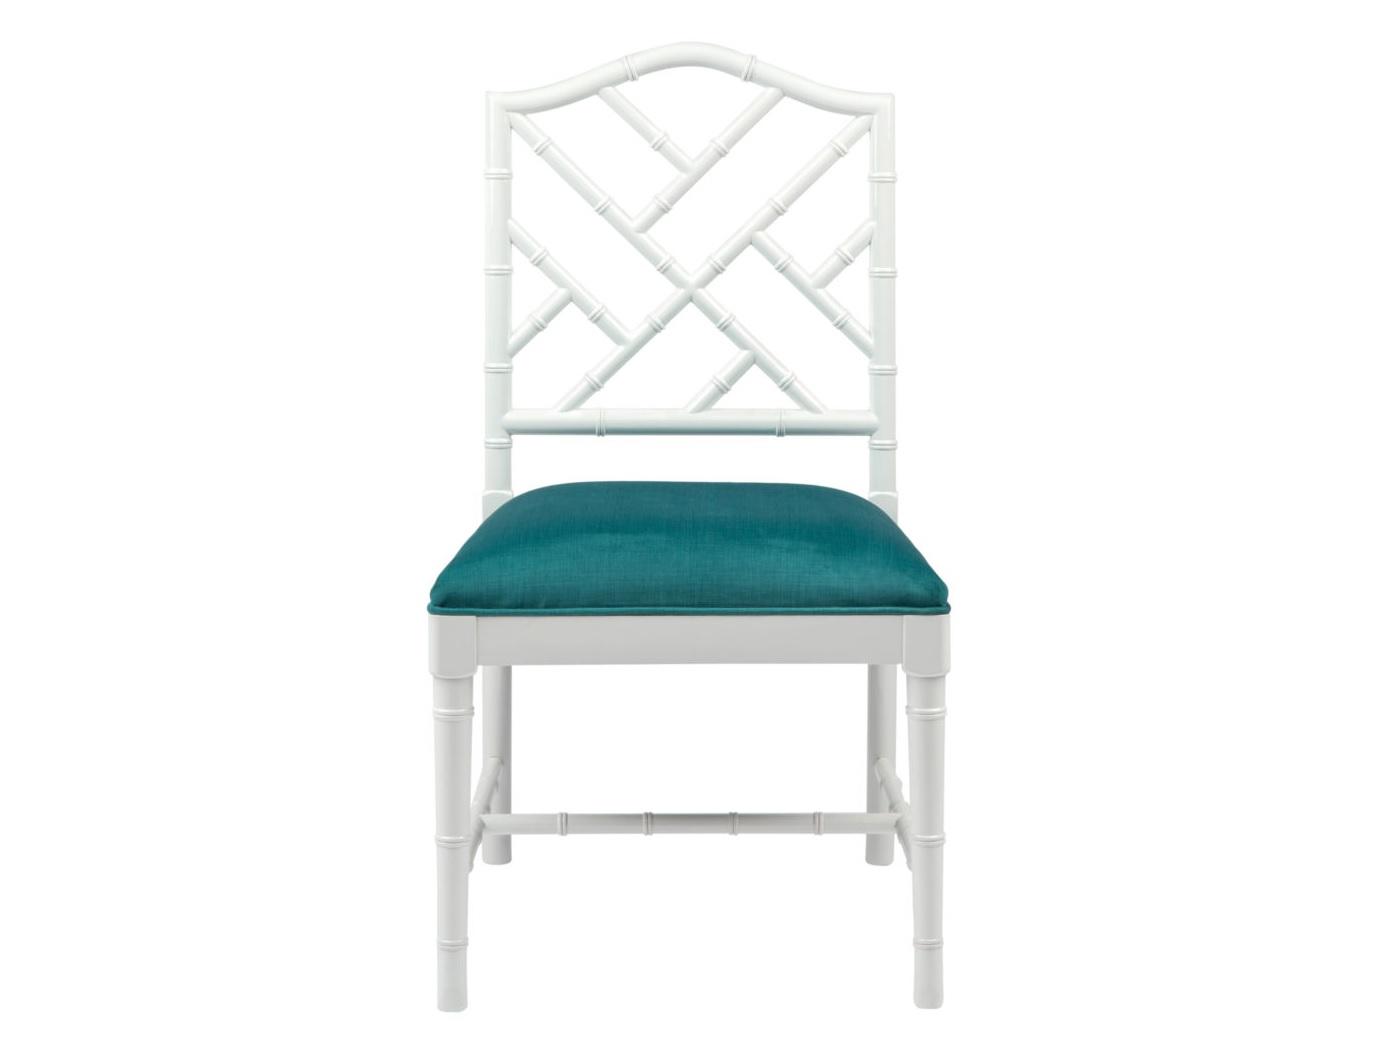 Кухонный стул M-Style 15436512 от thefurnish